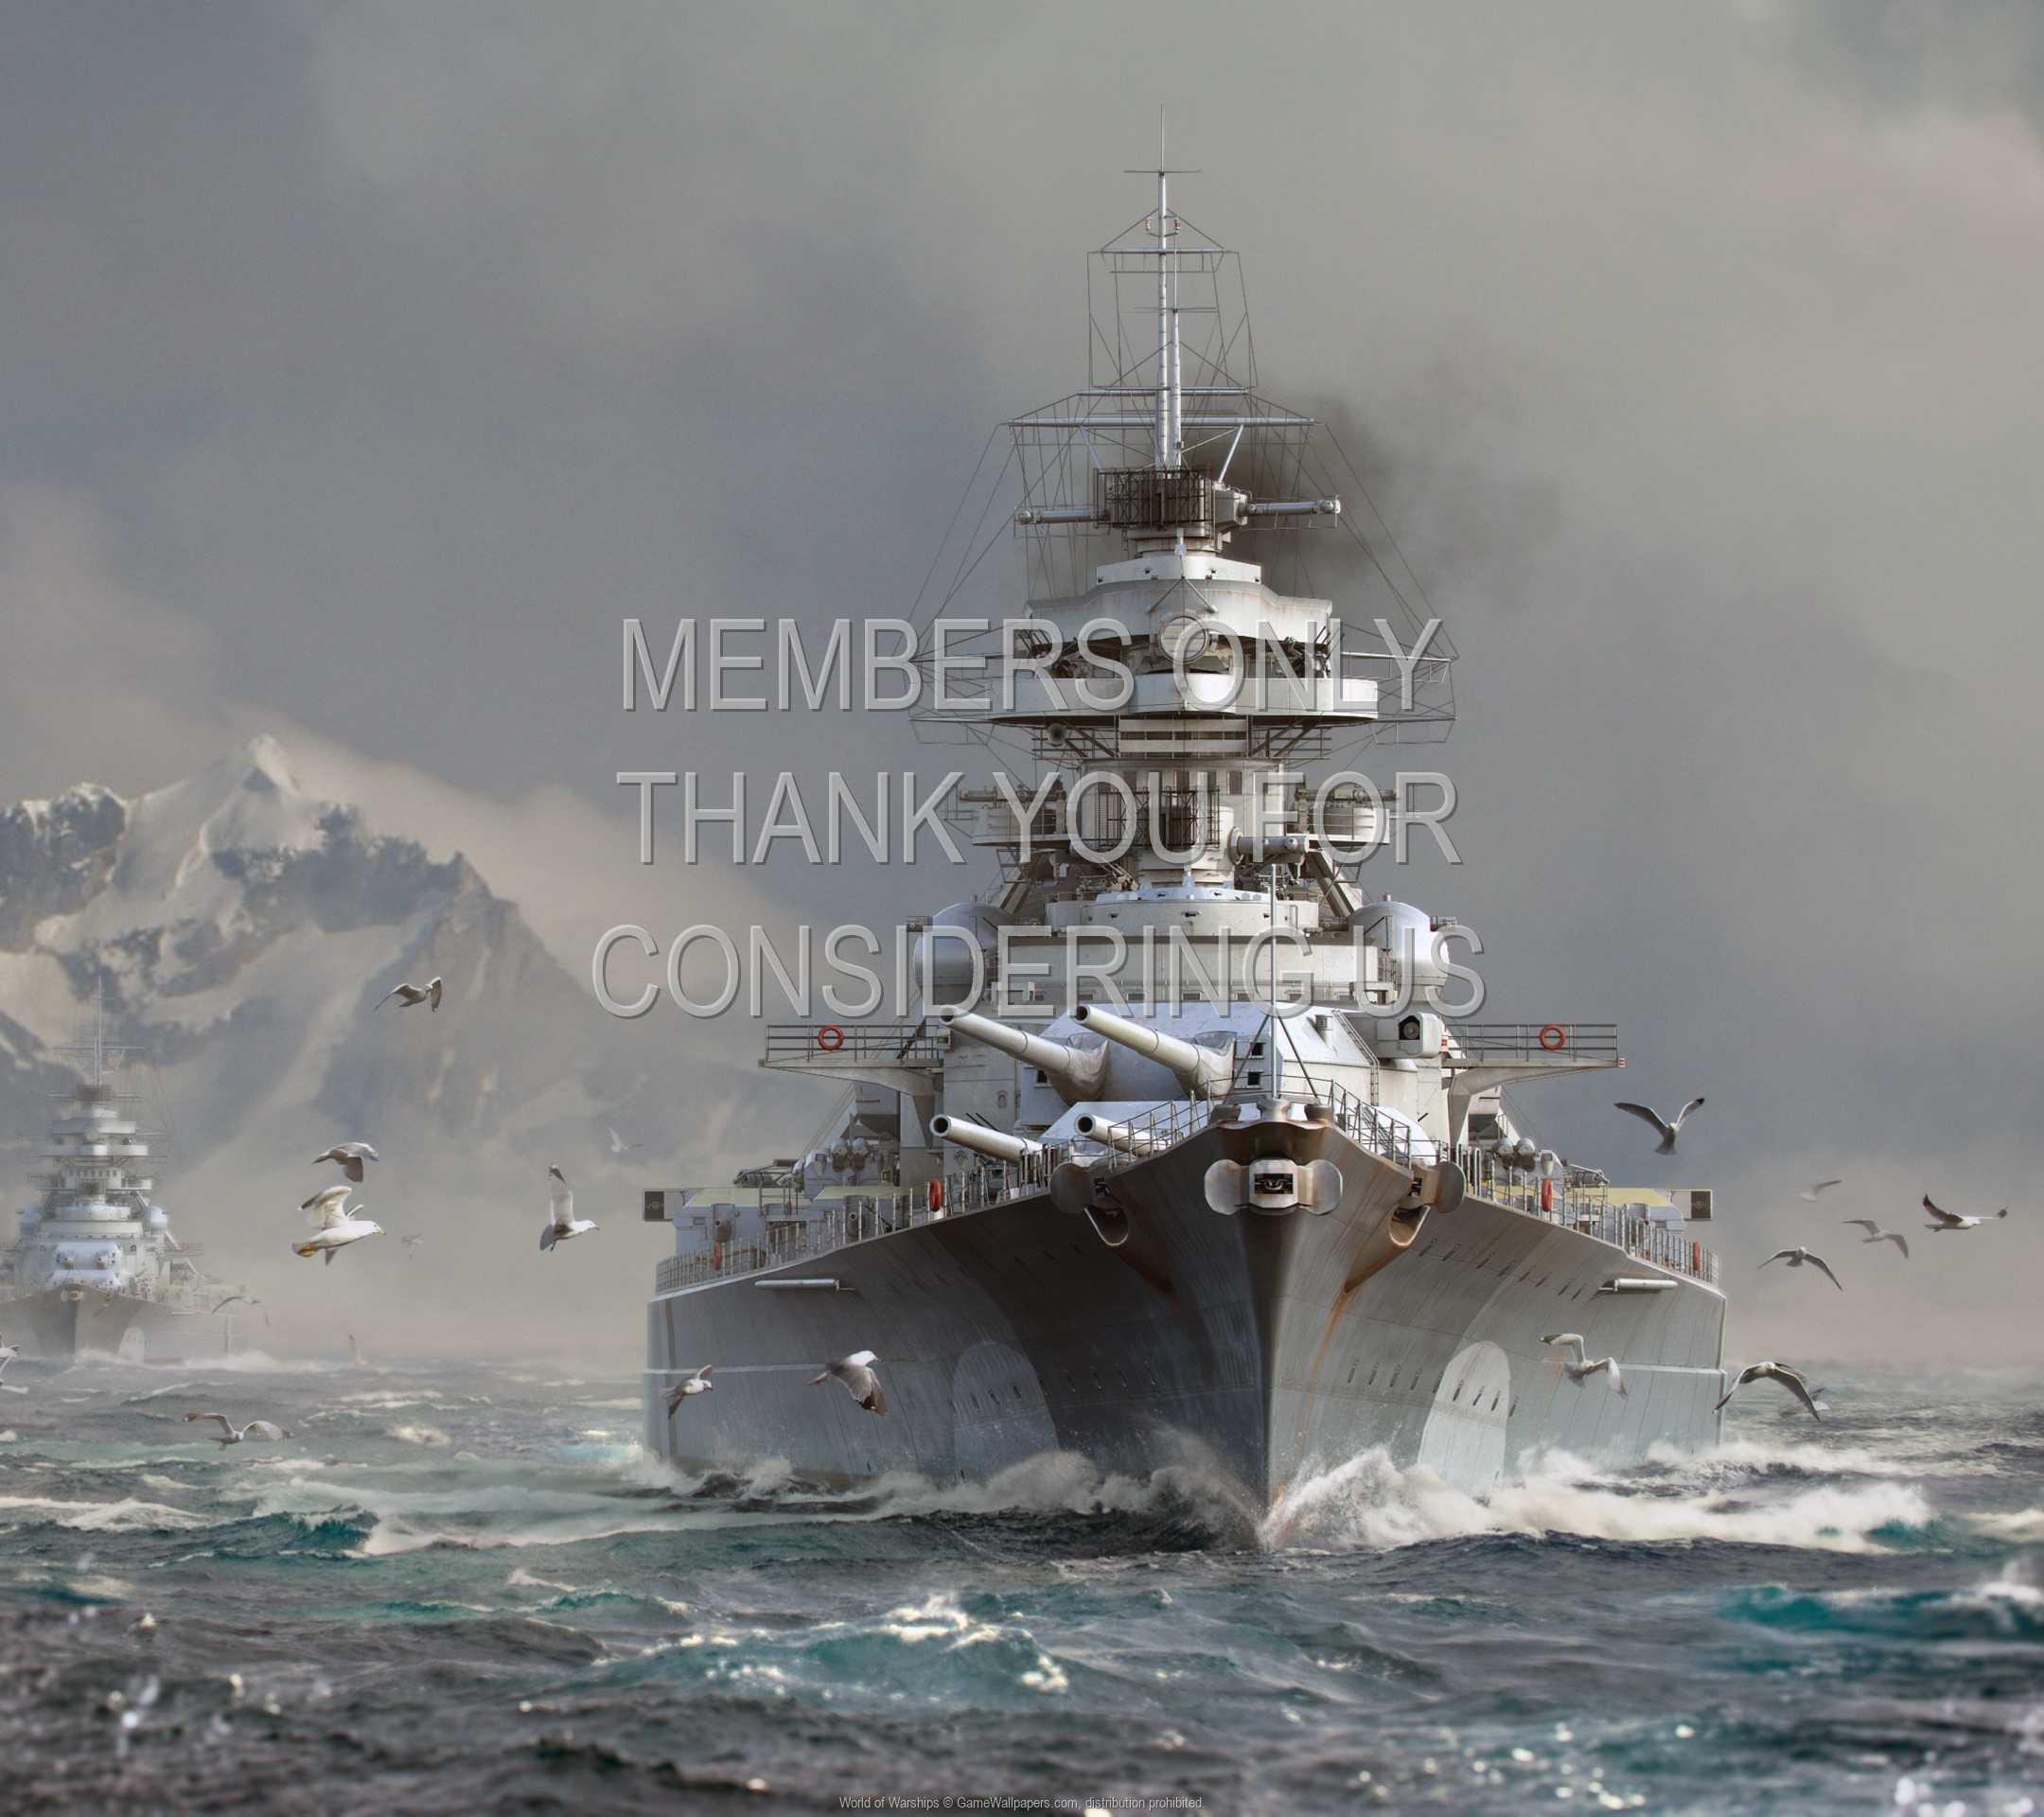 World of Warships 1080p Horizontal Mobile wallpaper or background 16